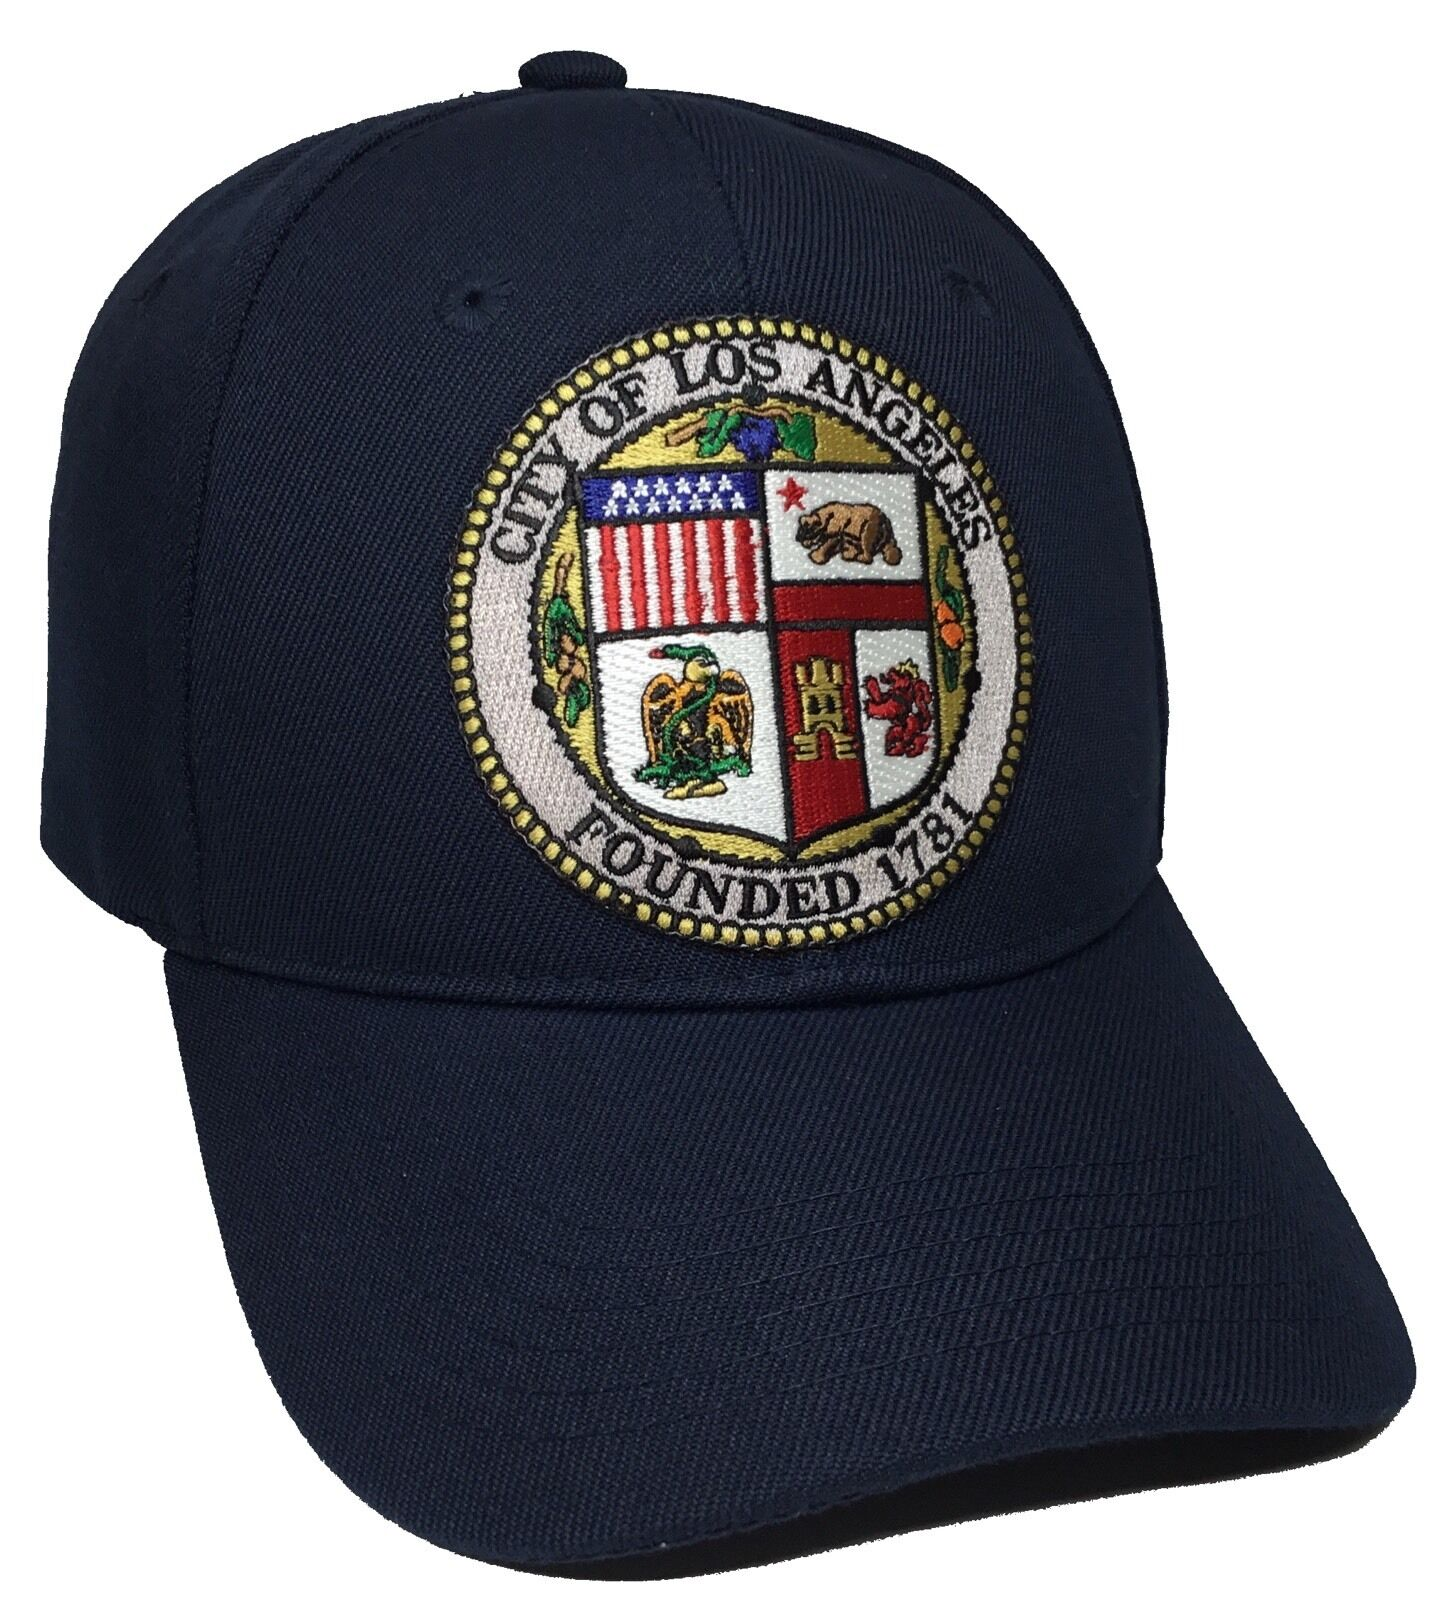 51e4e1bf3de ... clean up cap lyst 3f1db 824ae  discount code for city of los angeles hat  adjustable color navy black adjustable hat c0a4a7 cc6d3